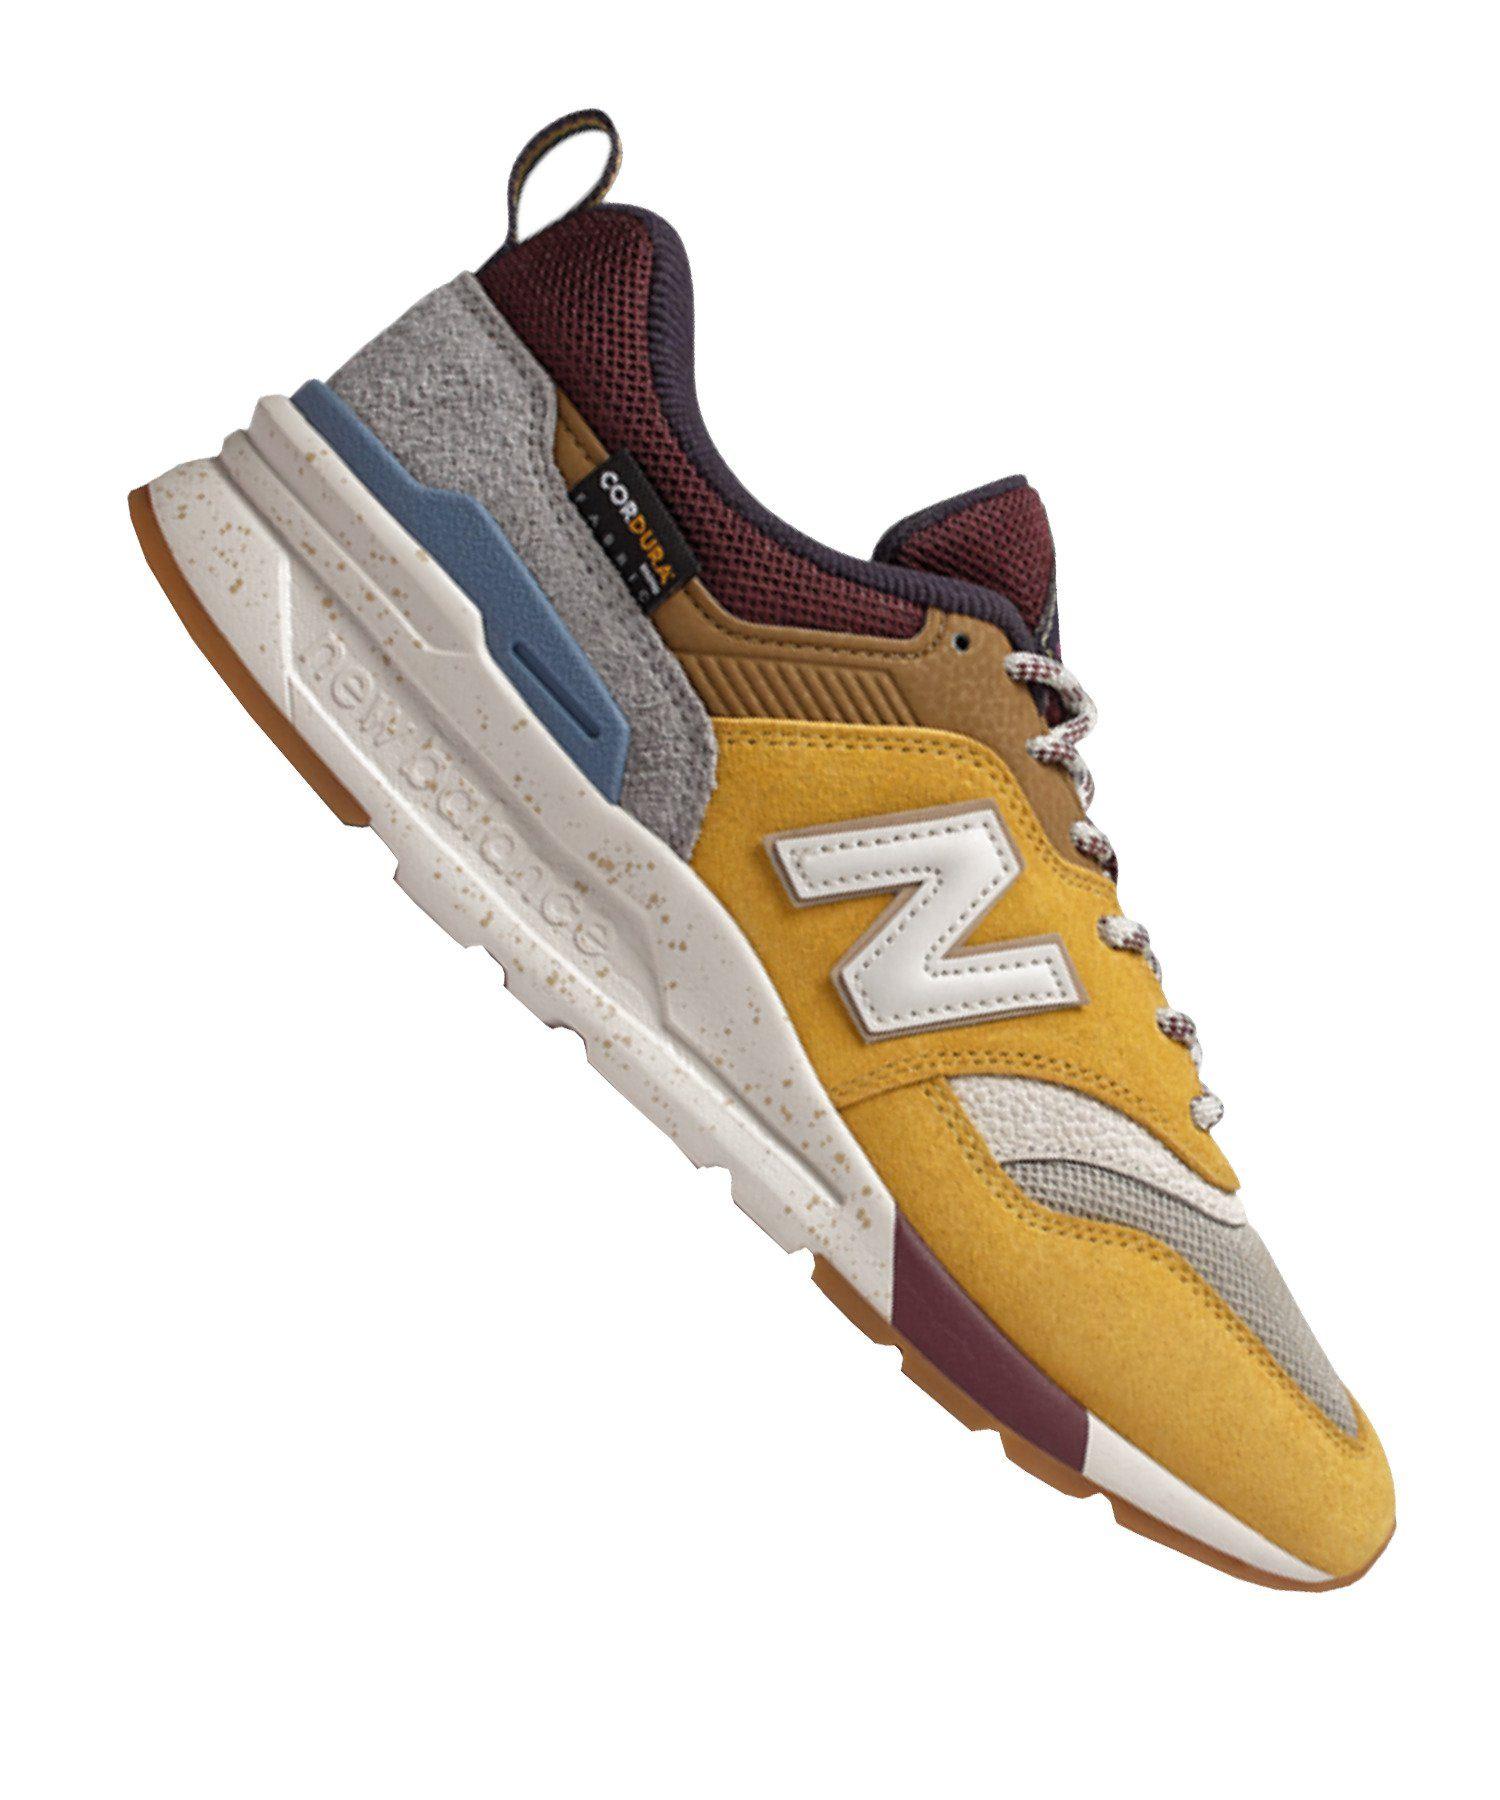 New Balance »CW997 B Sneaker Damen« Sneaker kaufen | OTTO